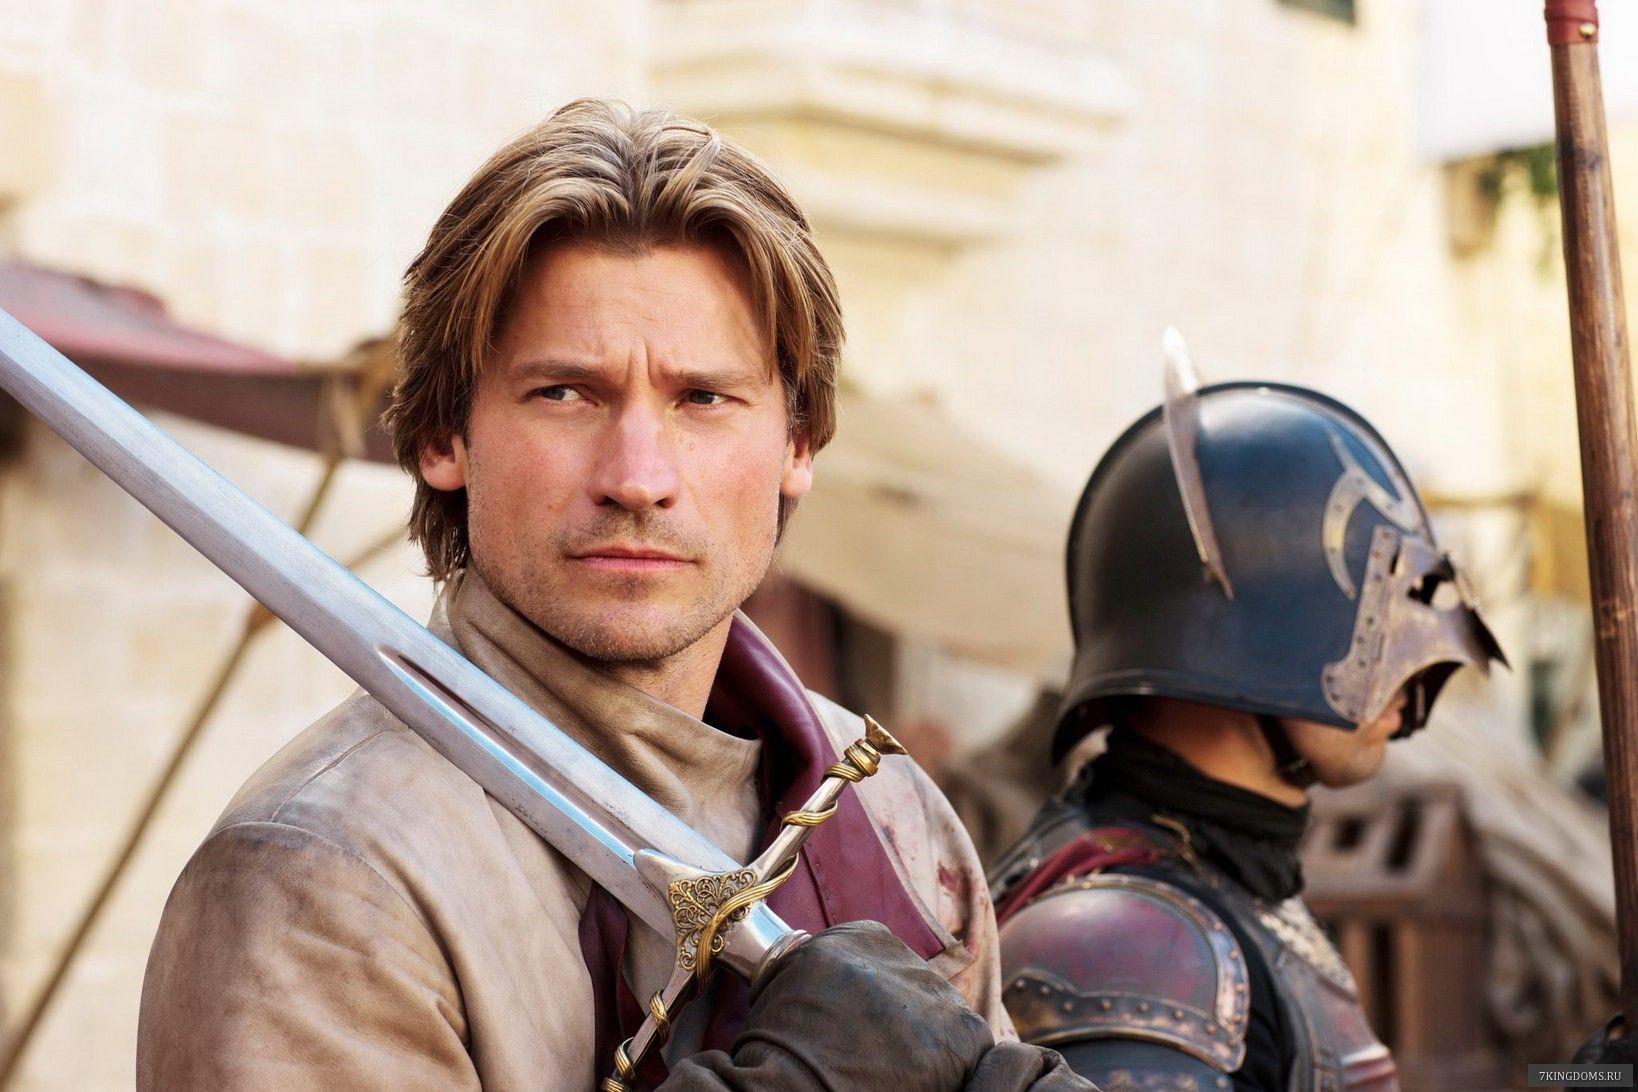 Jaime Lannister Sword The Sword Defending House Lannister In The New Season Of Game Of Thrones Want It Jaime Lannister Nikolaj Coster Nikolaj Coster Waldau